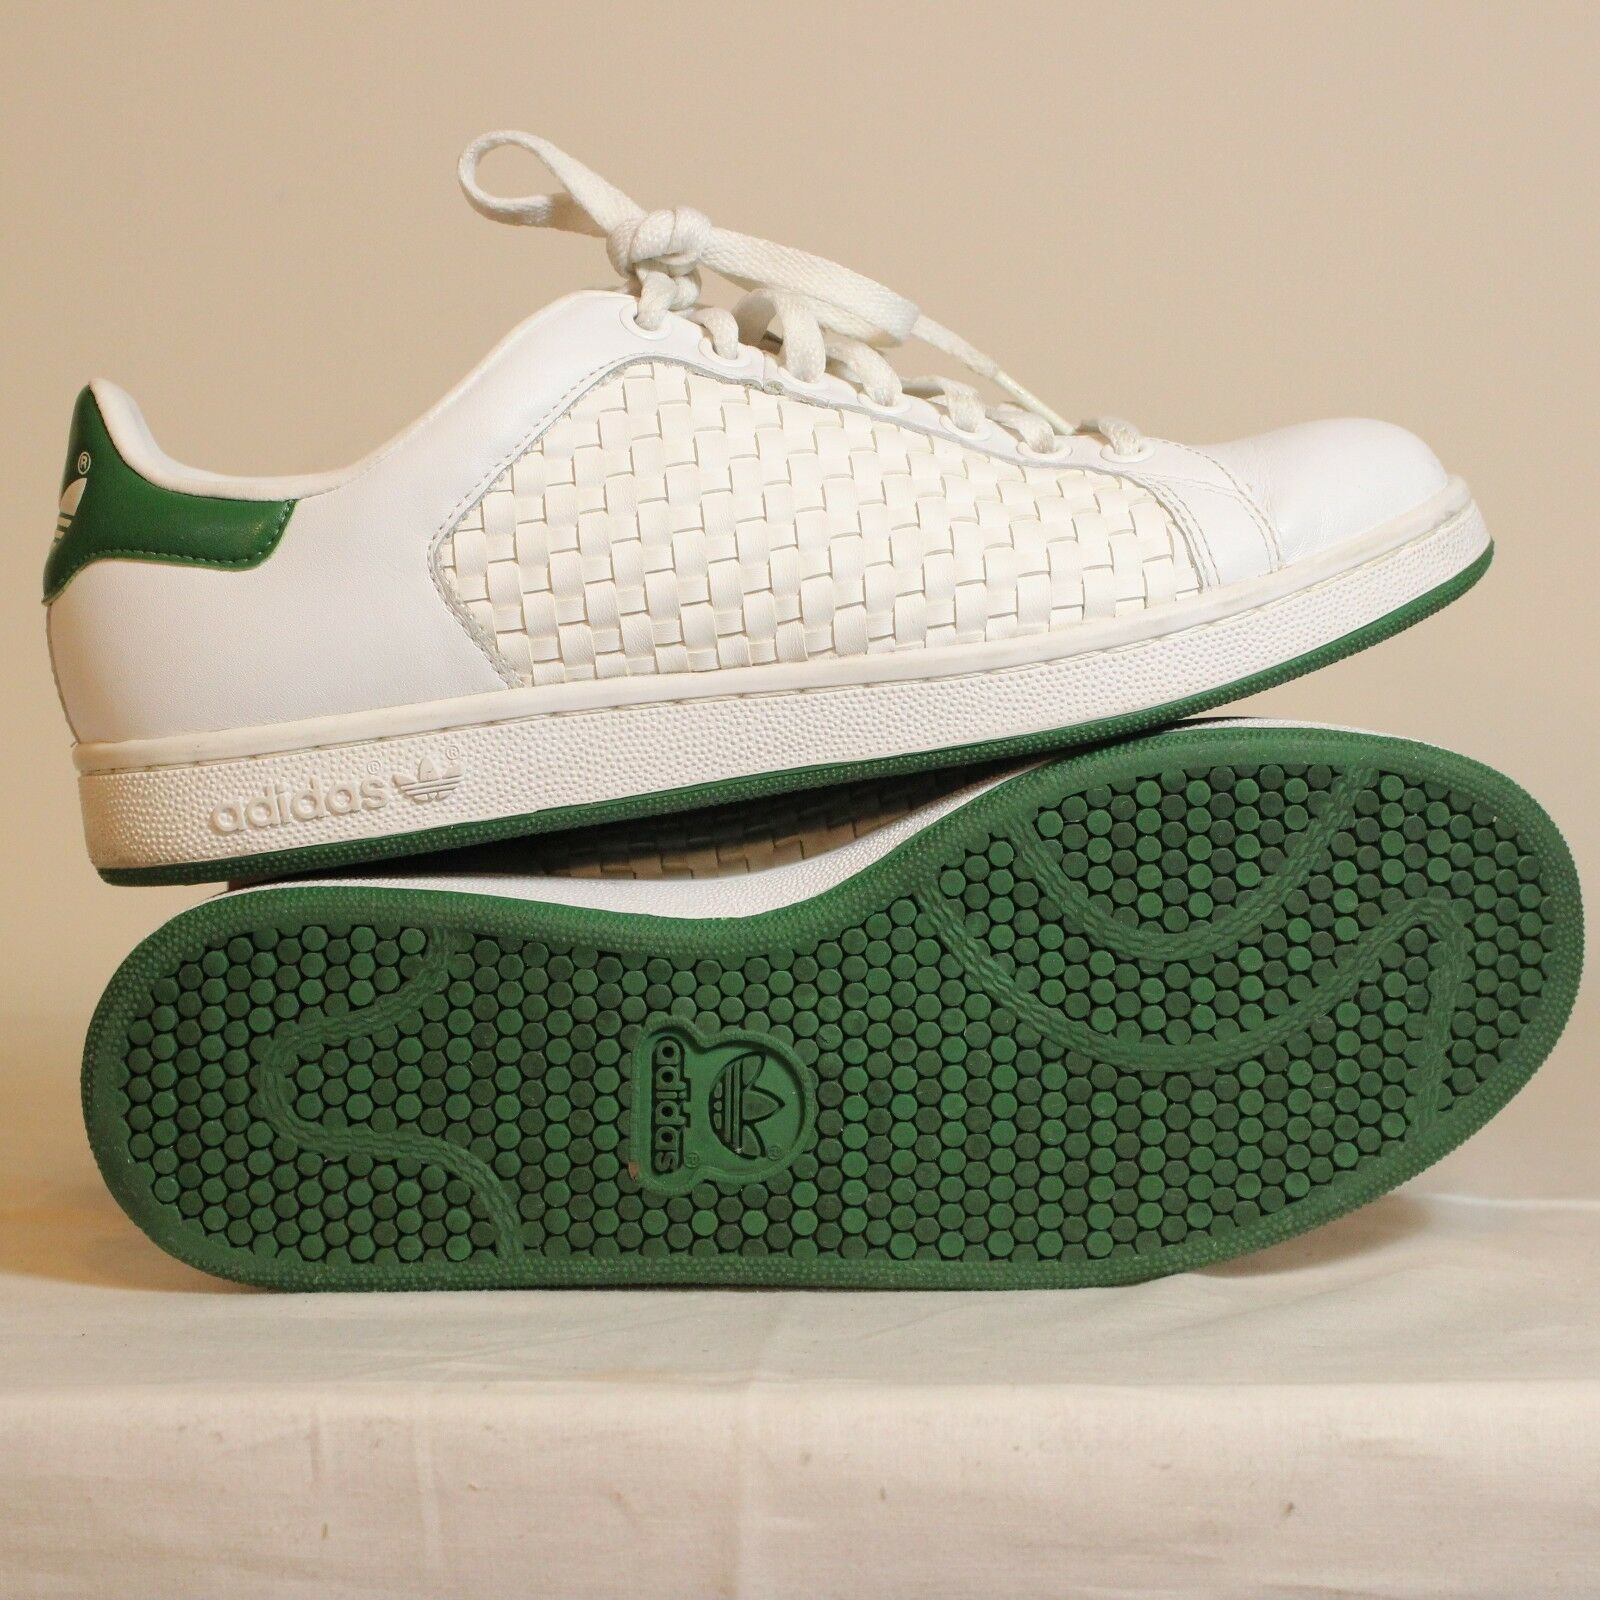 adidas (651846) stan smith weben 2 (651846) adidas männer schuhe größe 9 weiß - grüne c9d44c